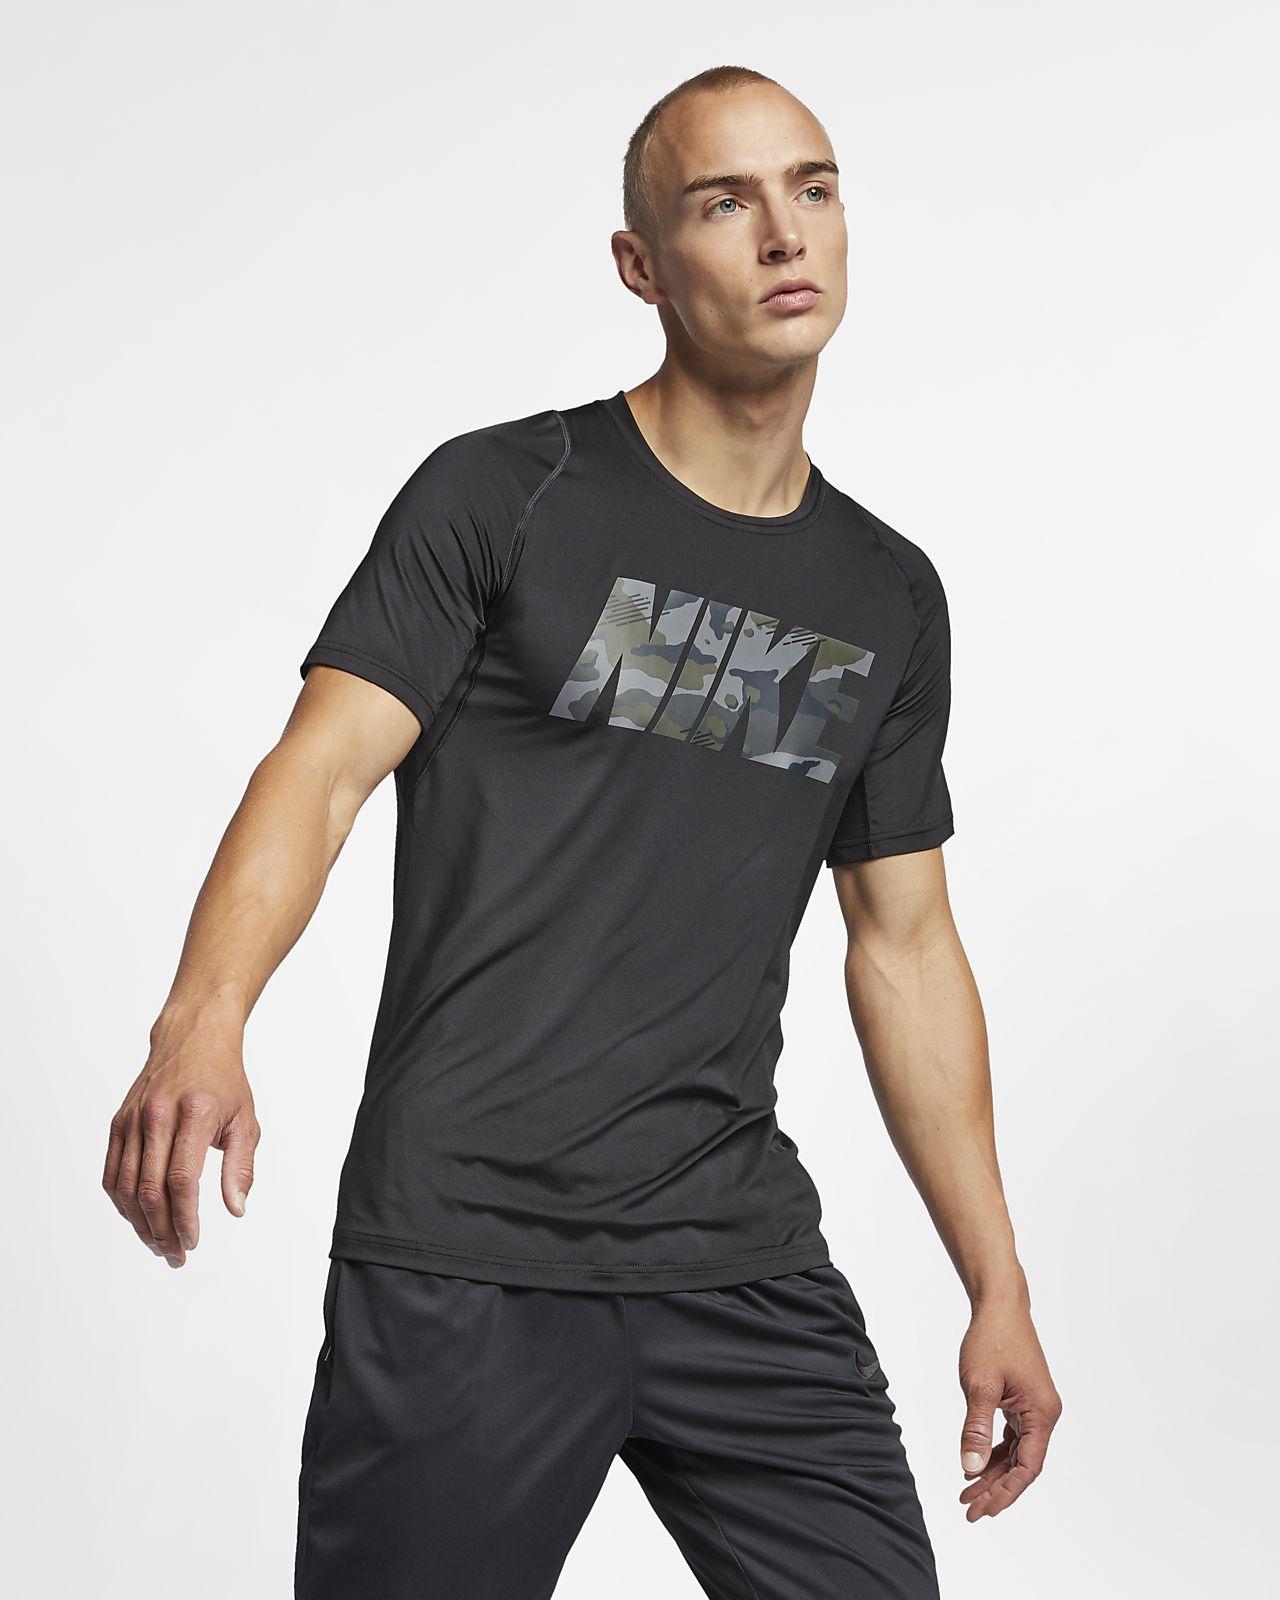 Nike Pro Men's Training Top